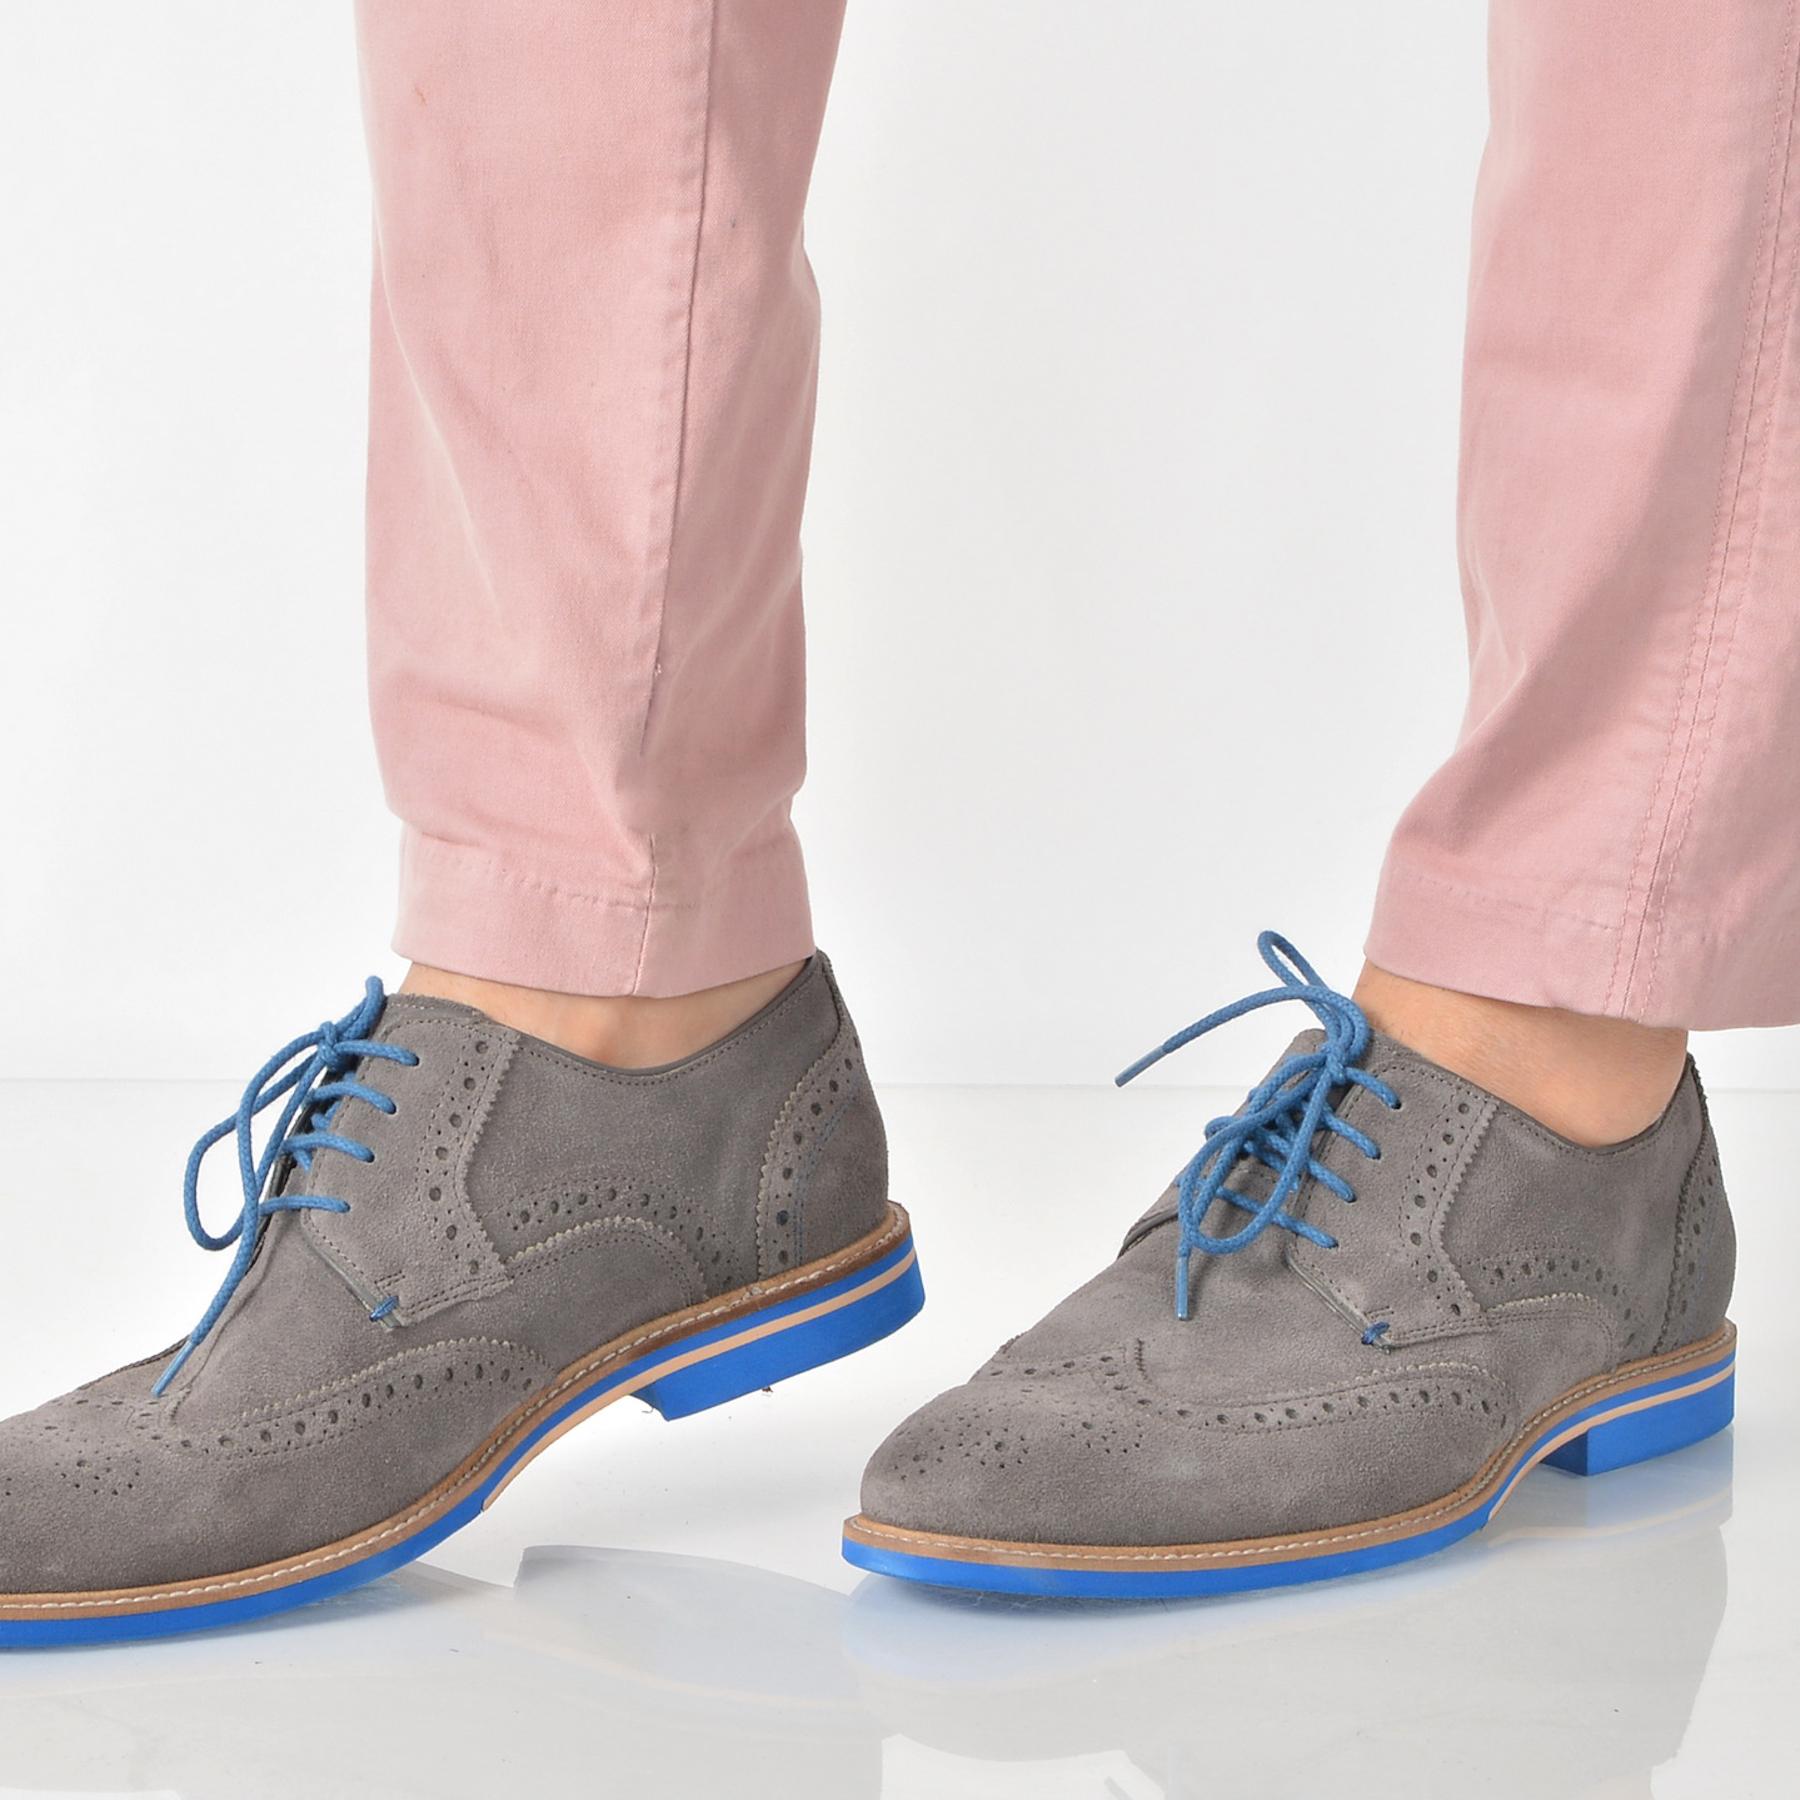 Pantofi Otter Gri, 3990, Din Piele Intoarsa